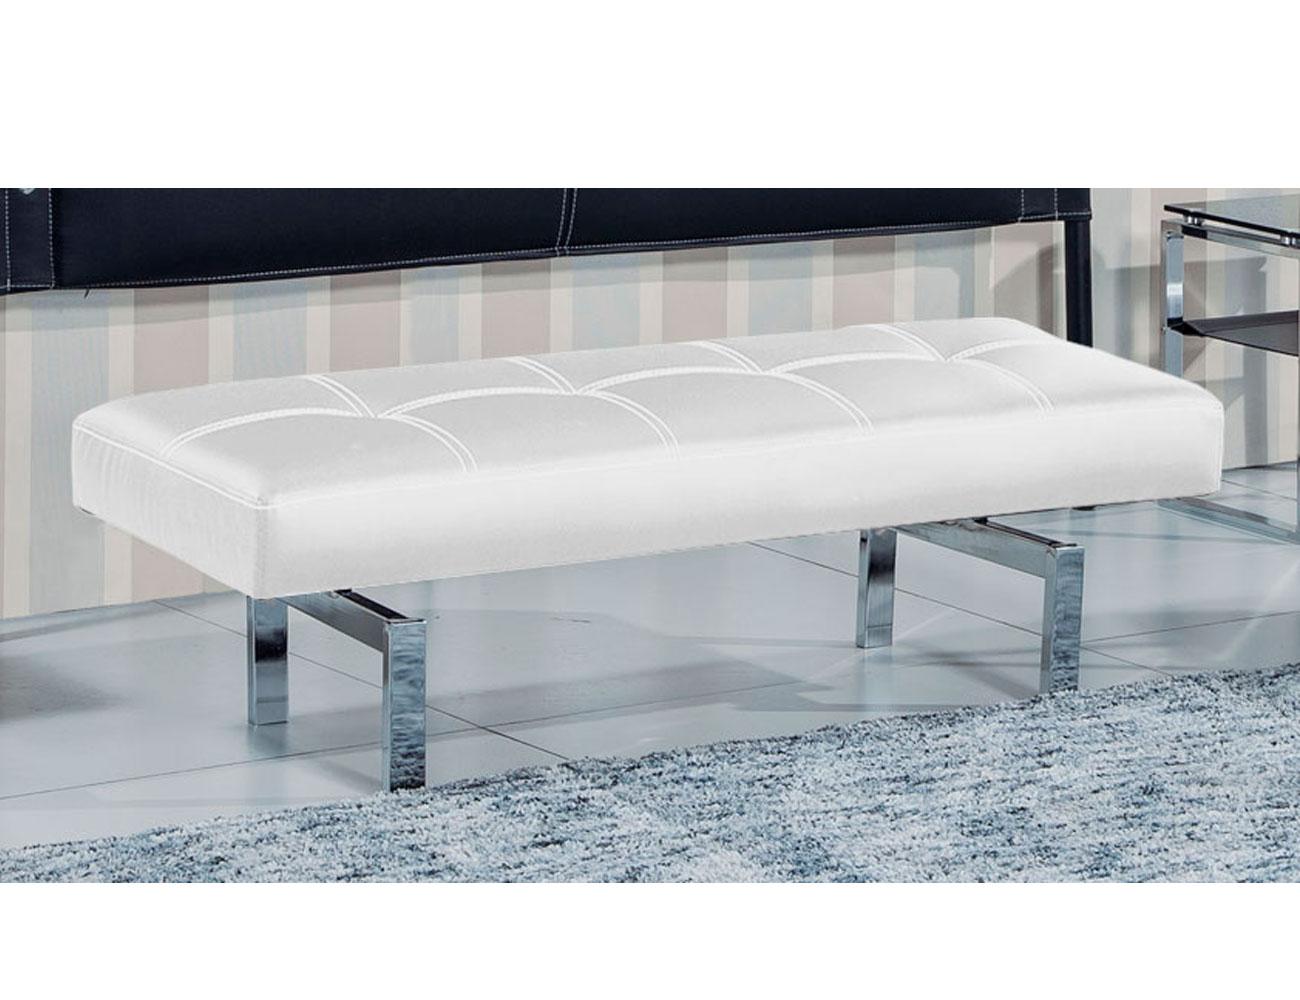 Banco banqueta tapizado polipiel blanco